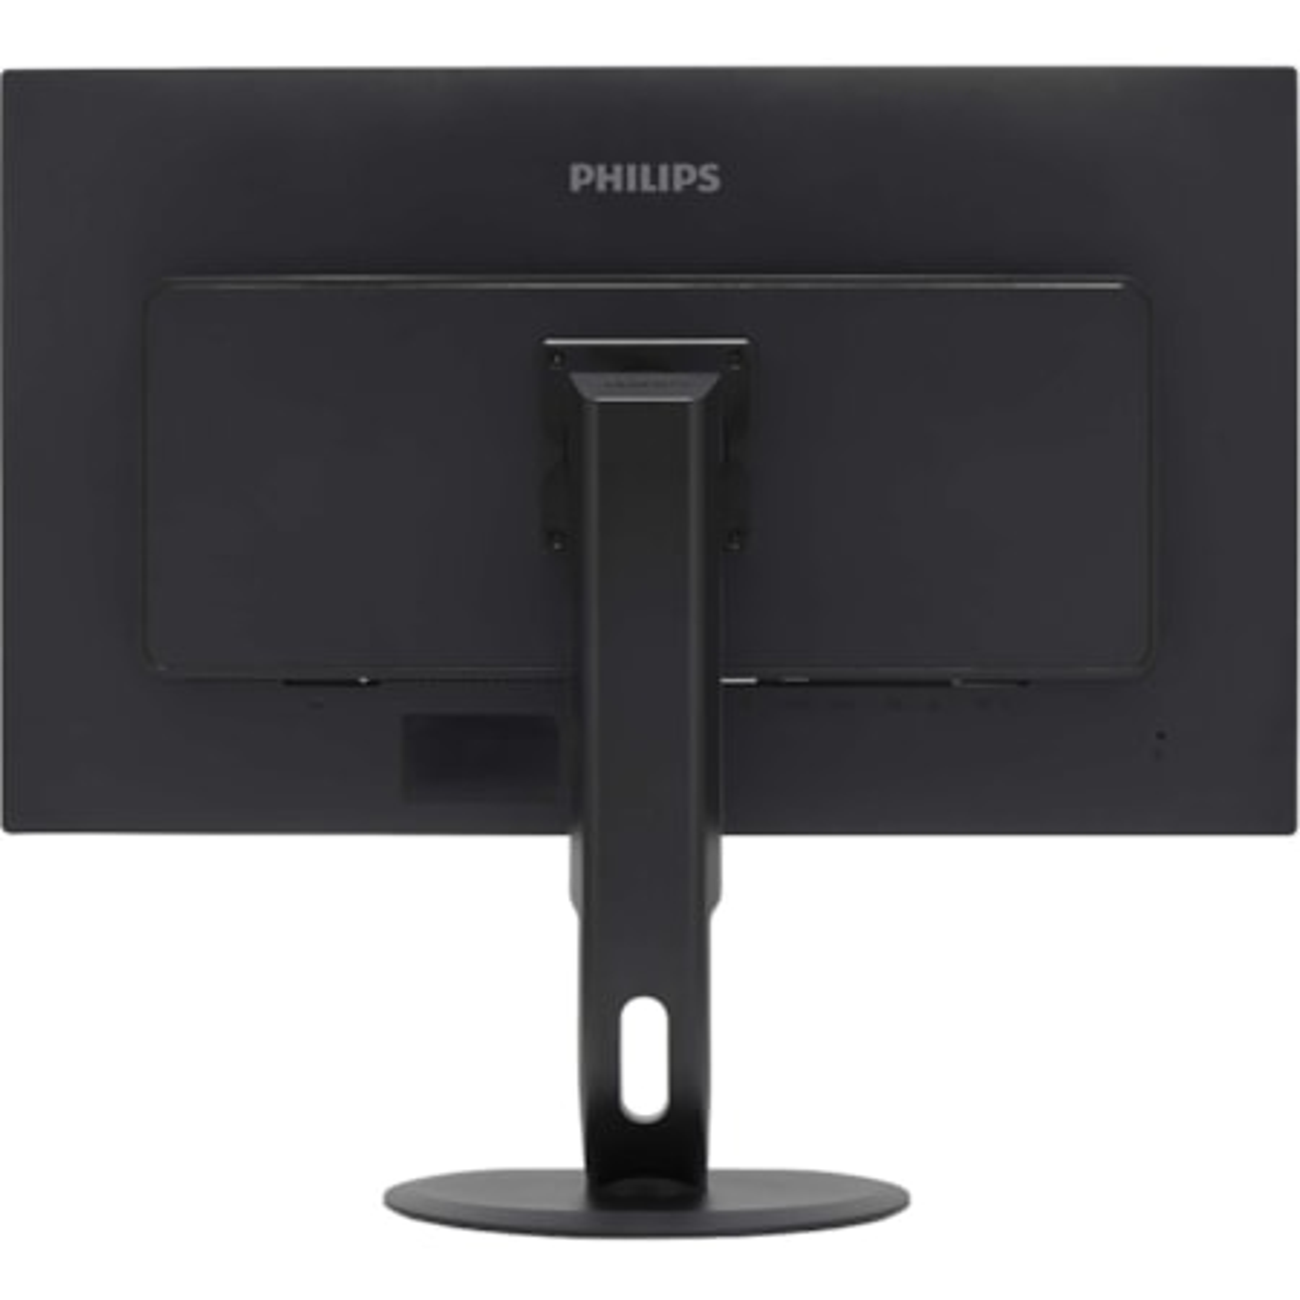 "Philips Brilliance 328P6AUBREB 80 cm (31.5"") QHD WLED LCD Monitor - 16:9 - Textured Black"